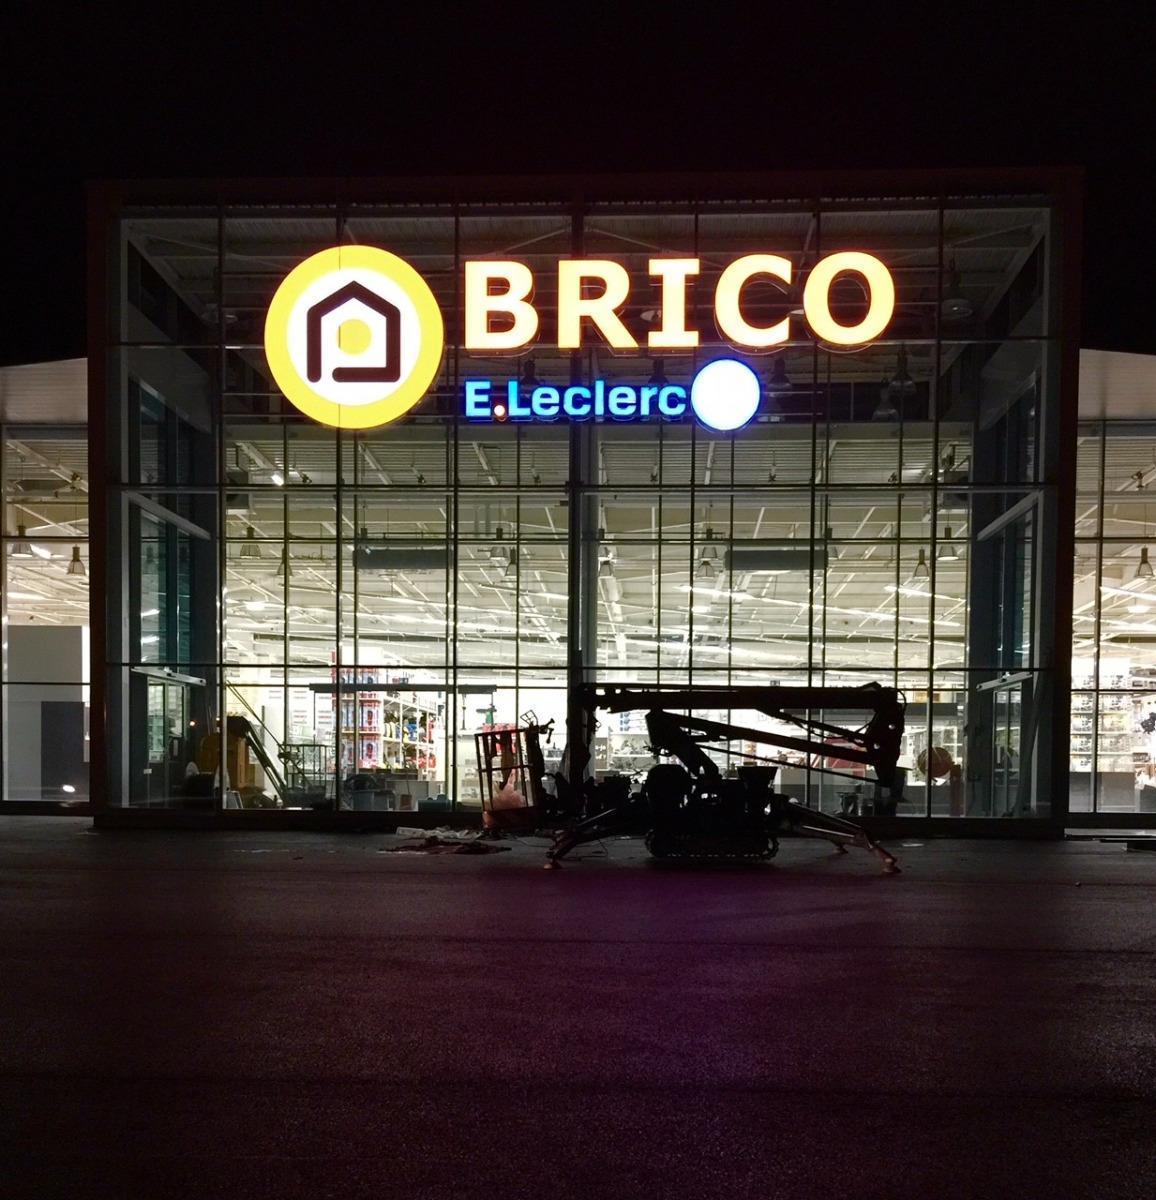 Pose de l'enseigne BRICO E. LECLERC